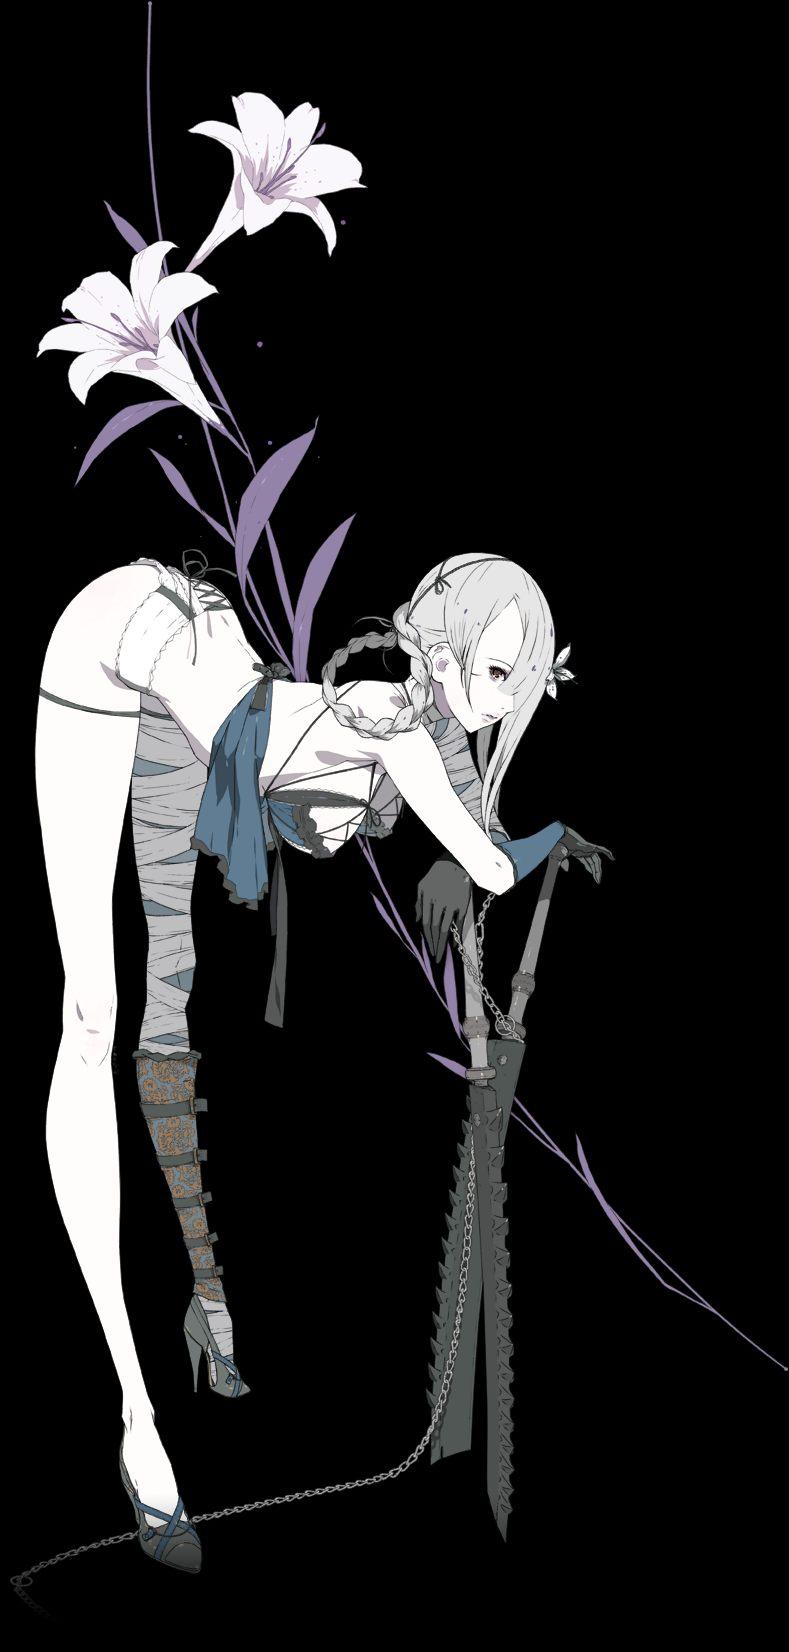 clip royalty free library Kain nier wiki fandom. Bandage drawing fantasy